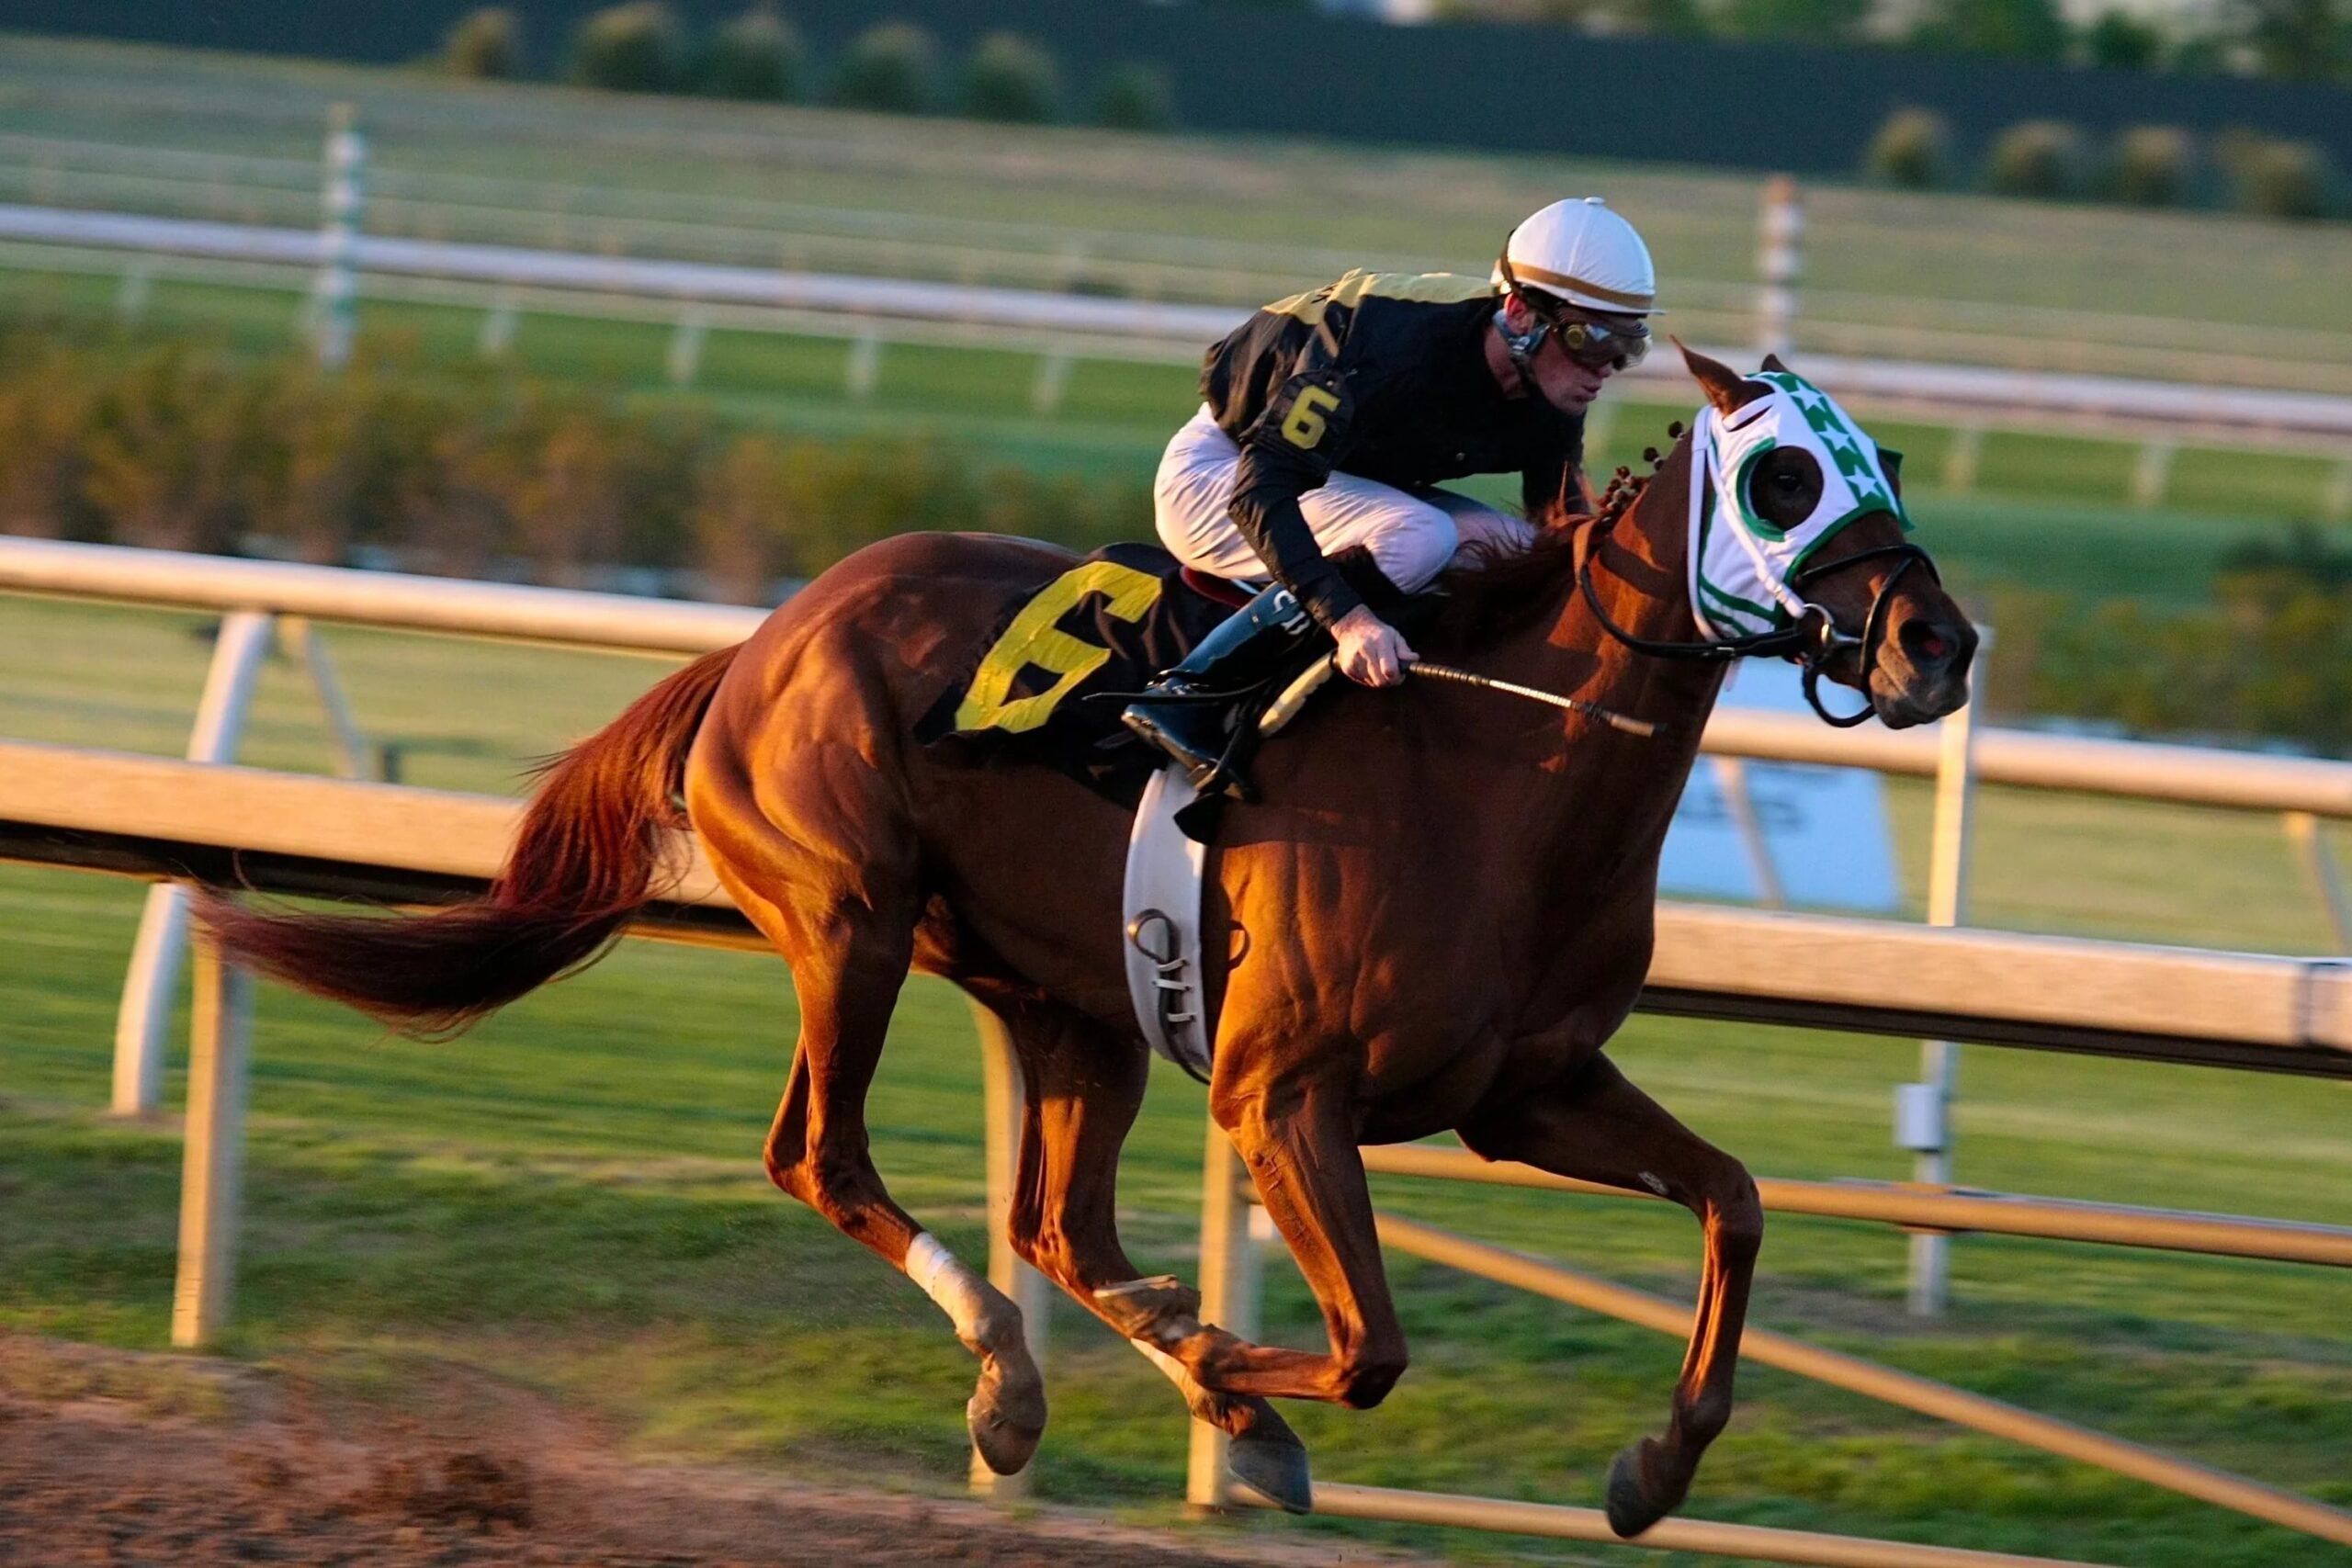 Casinoper Online At Yarışı